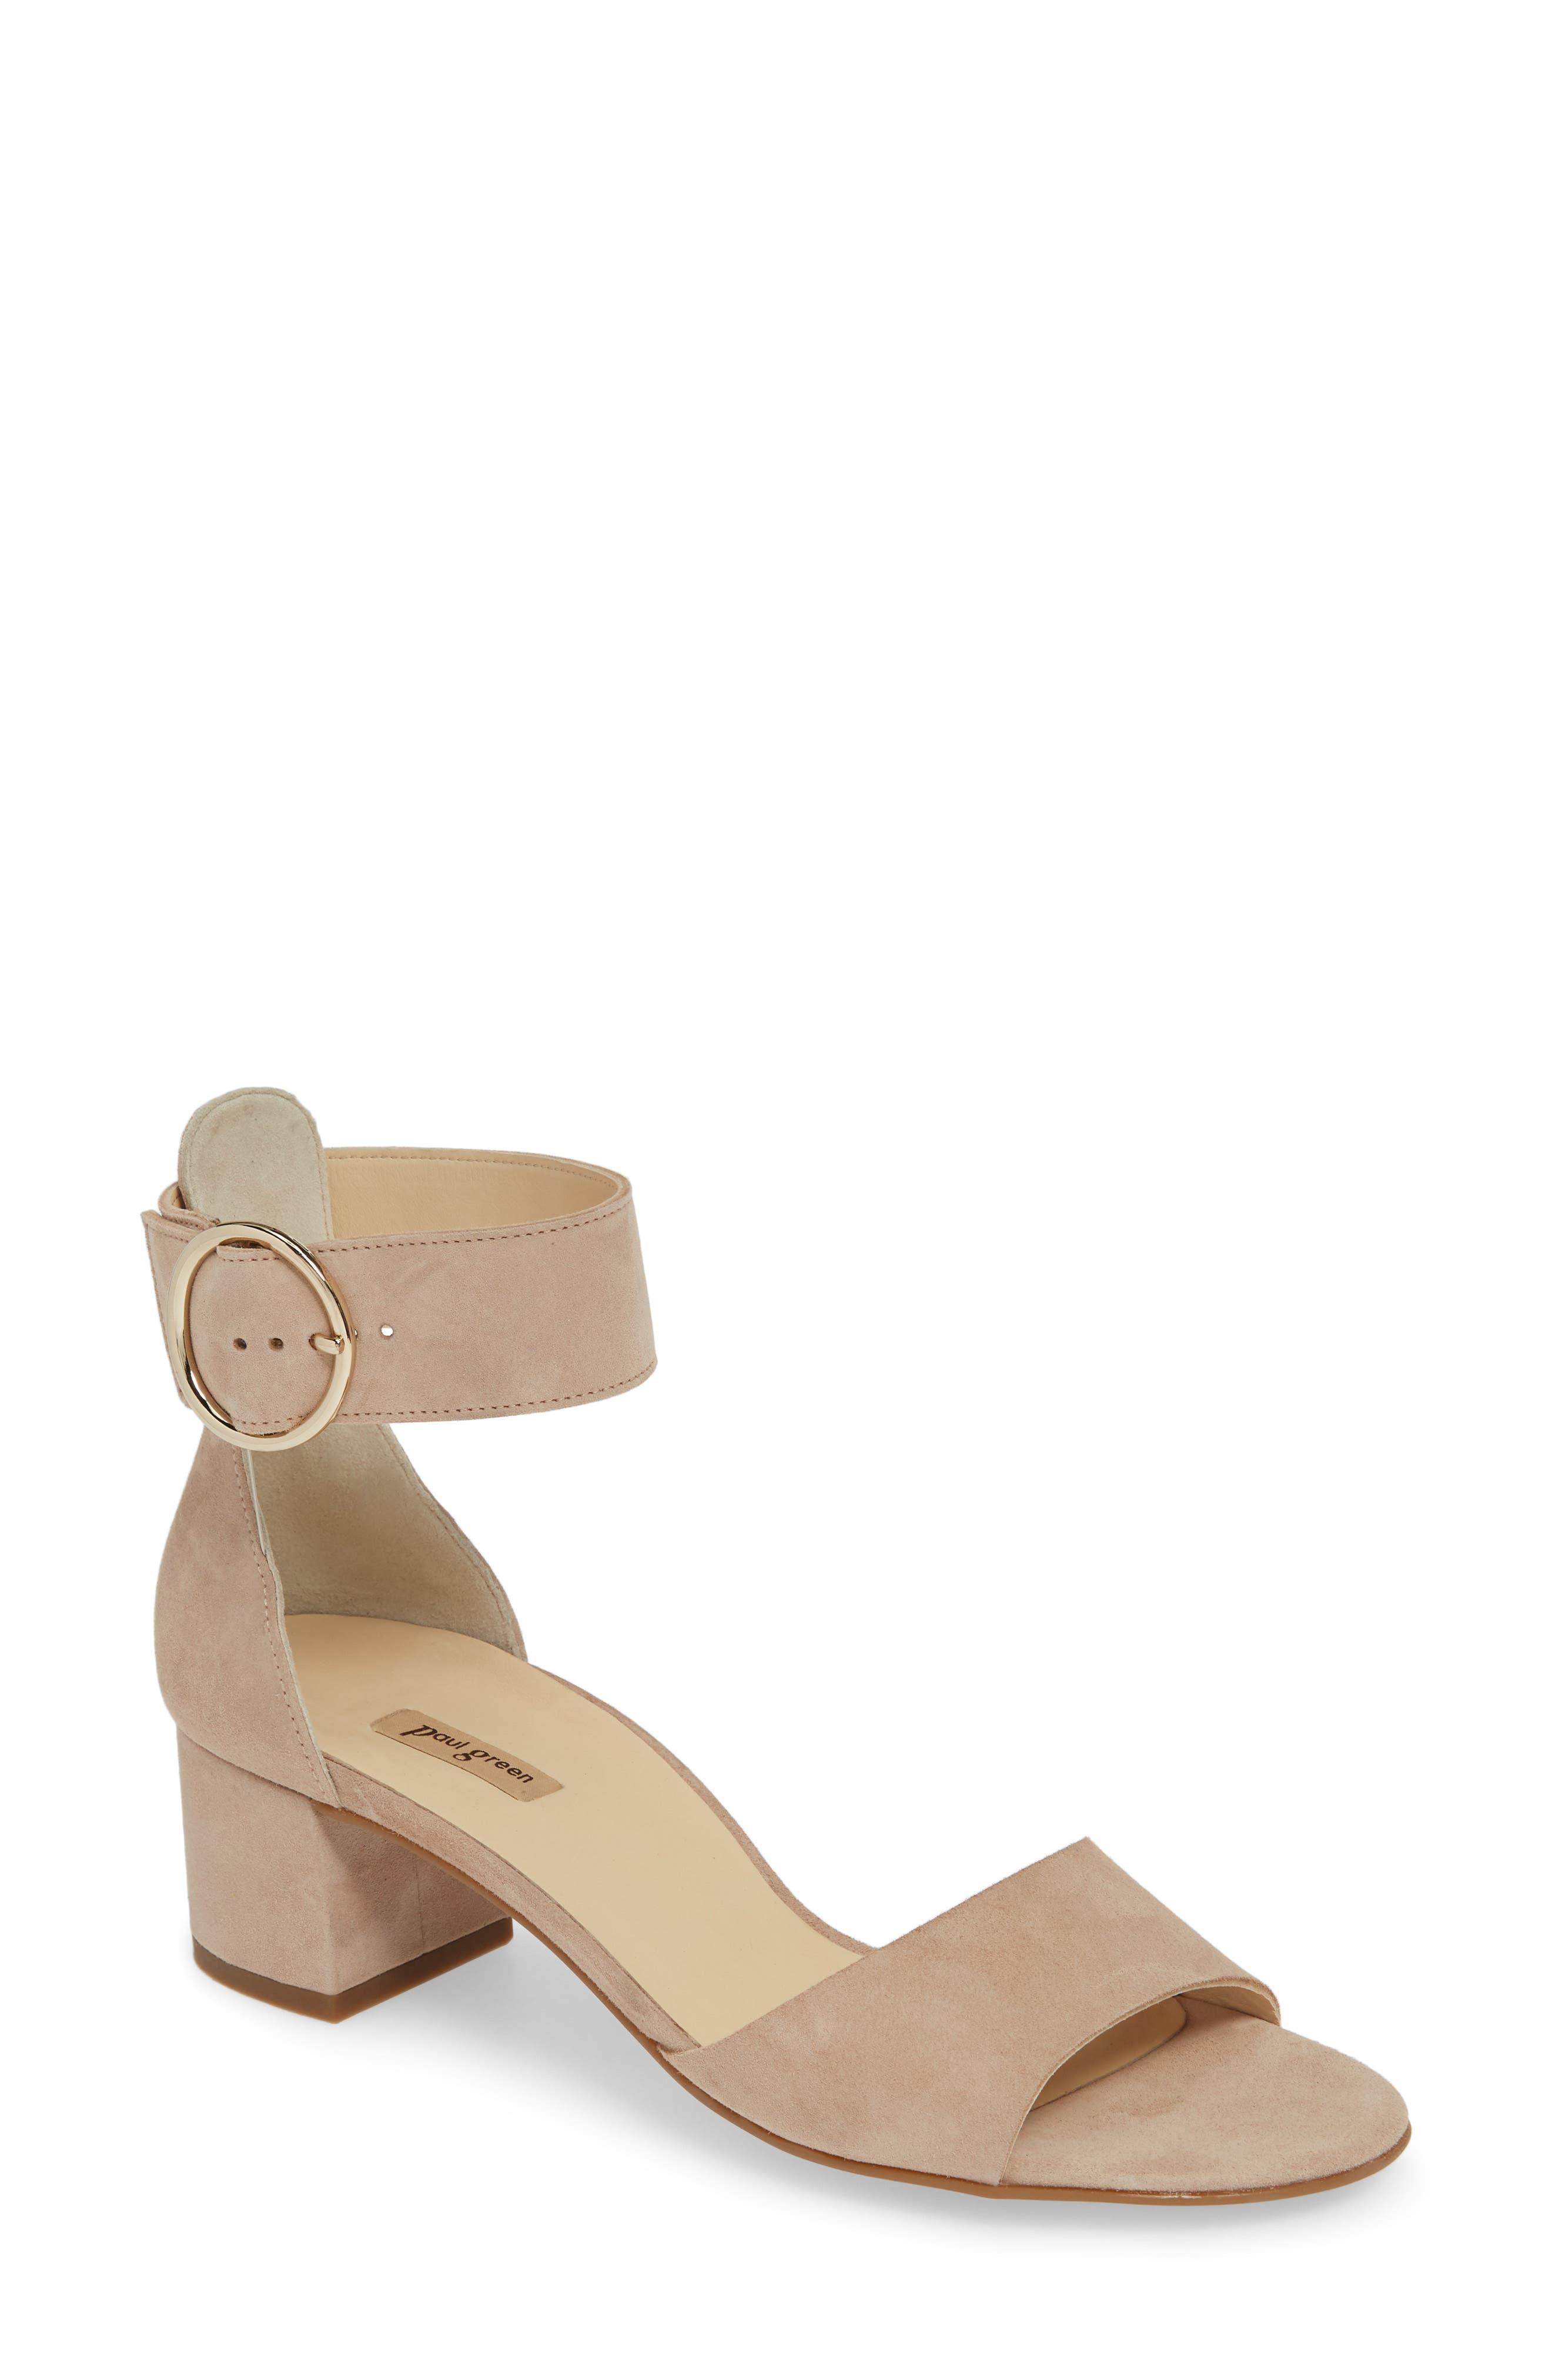 PAUL GREEN Velma Ankle Strap Sandal, Main, color, SAHARA SUEDE